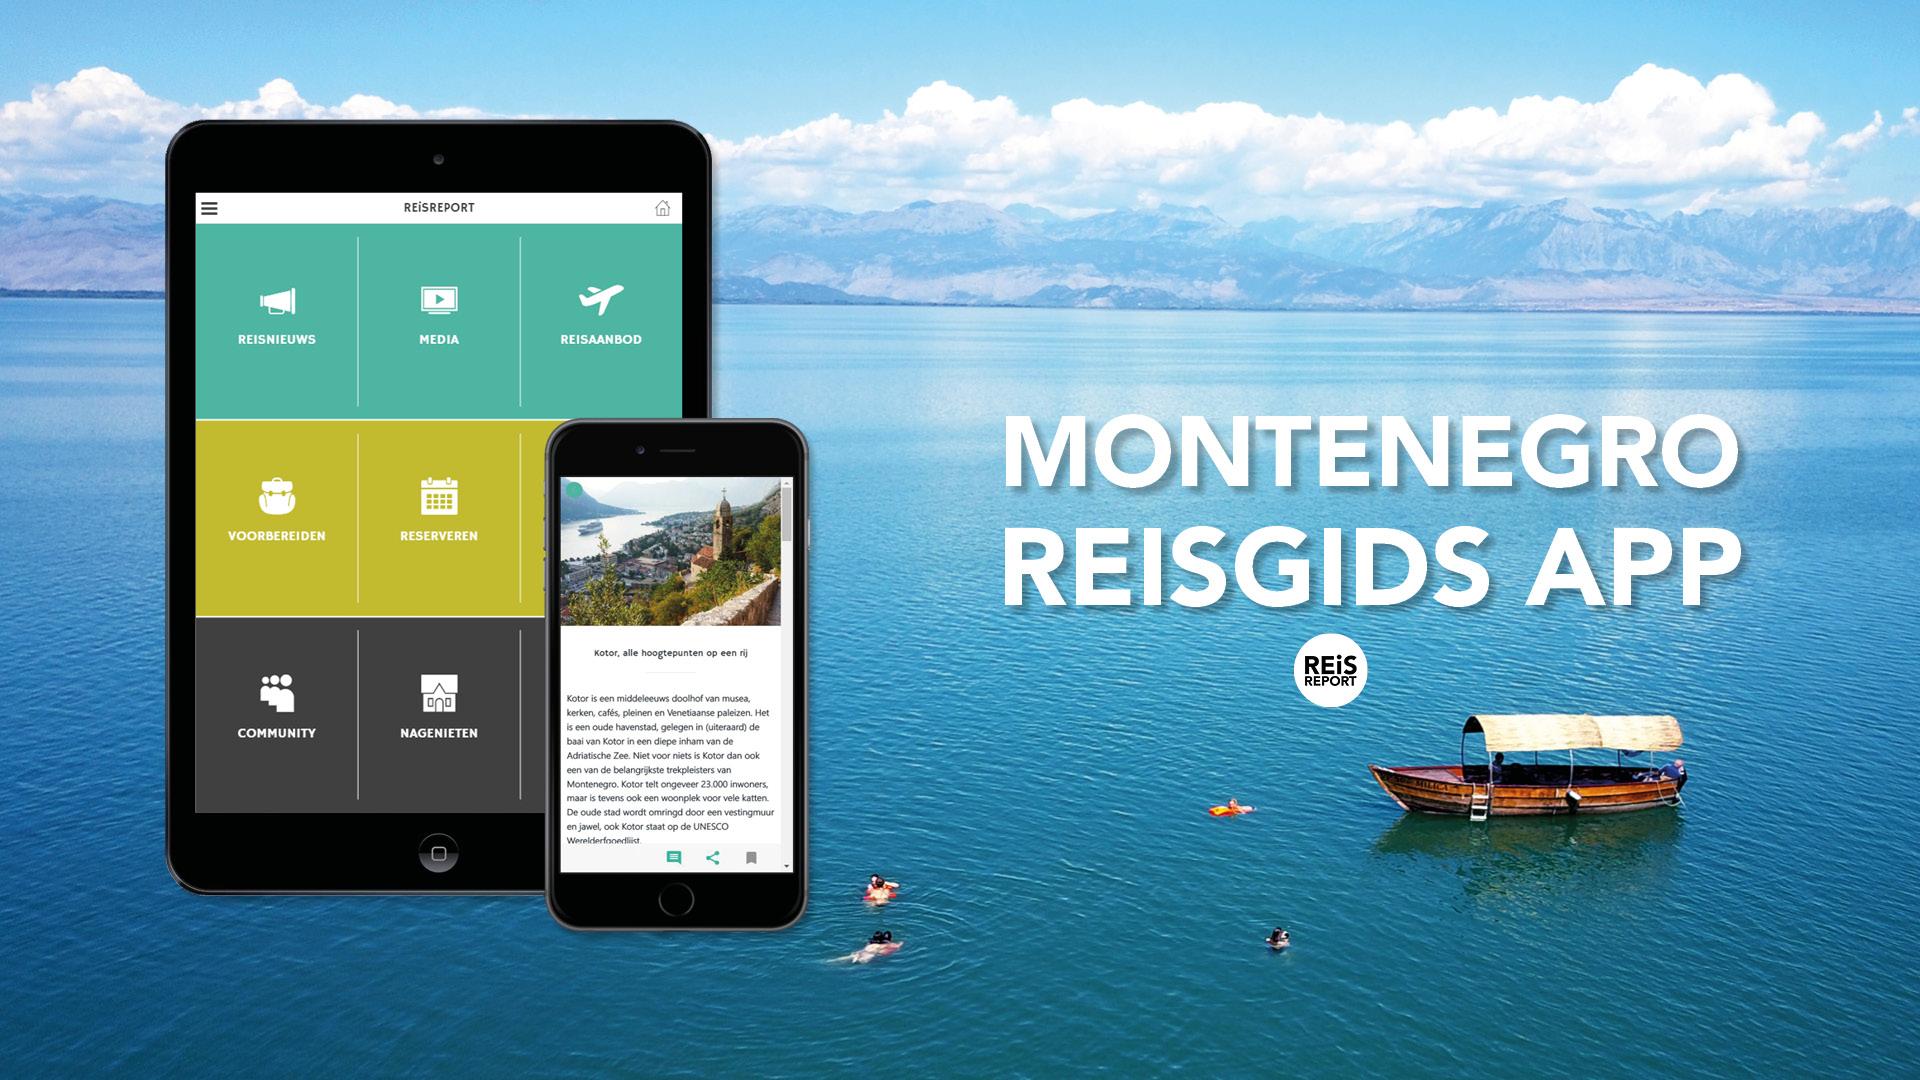 Montenegro reisgids